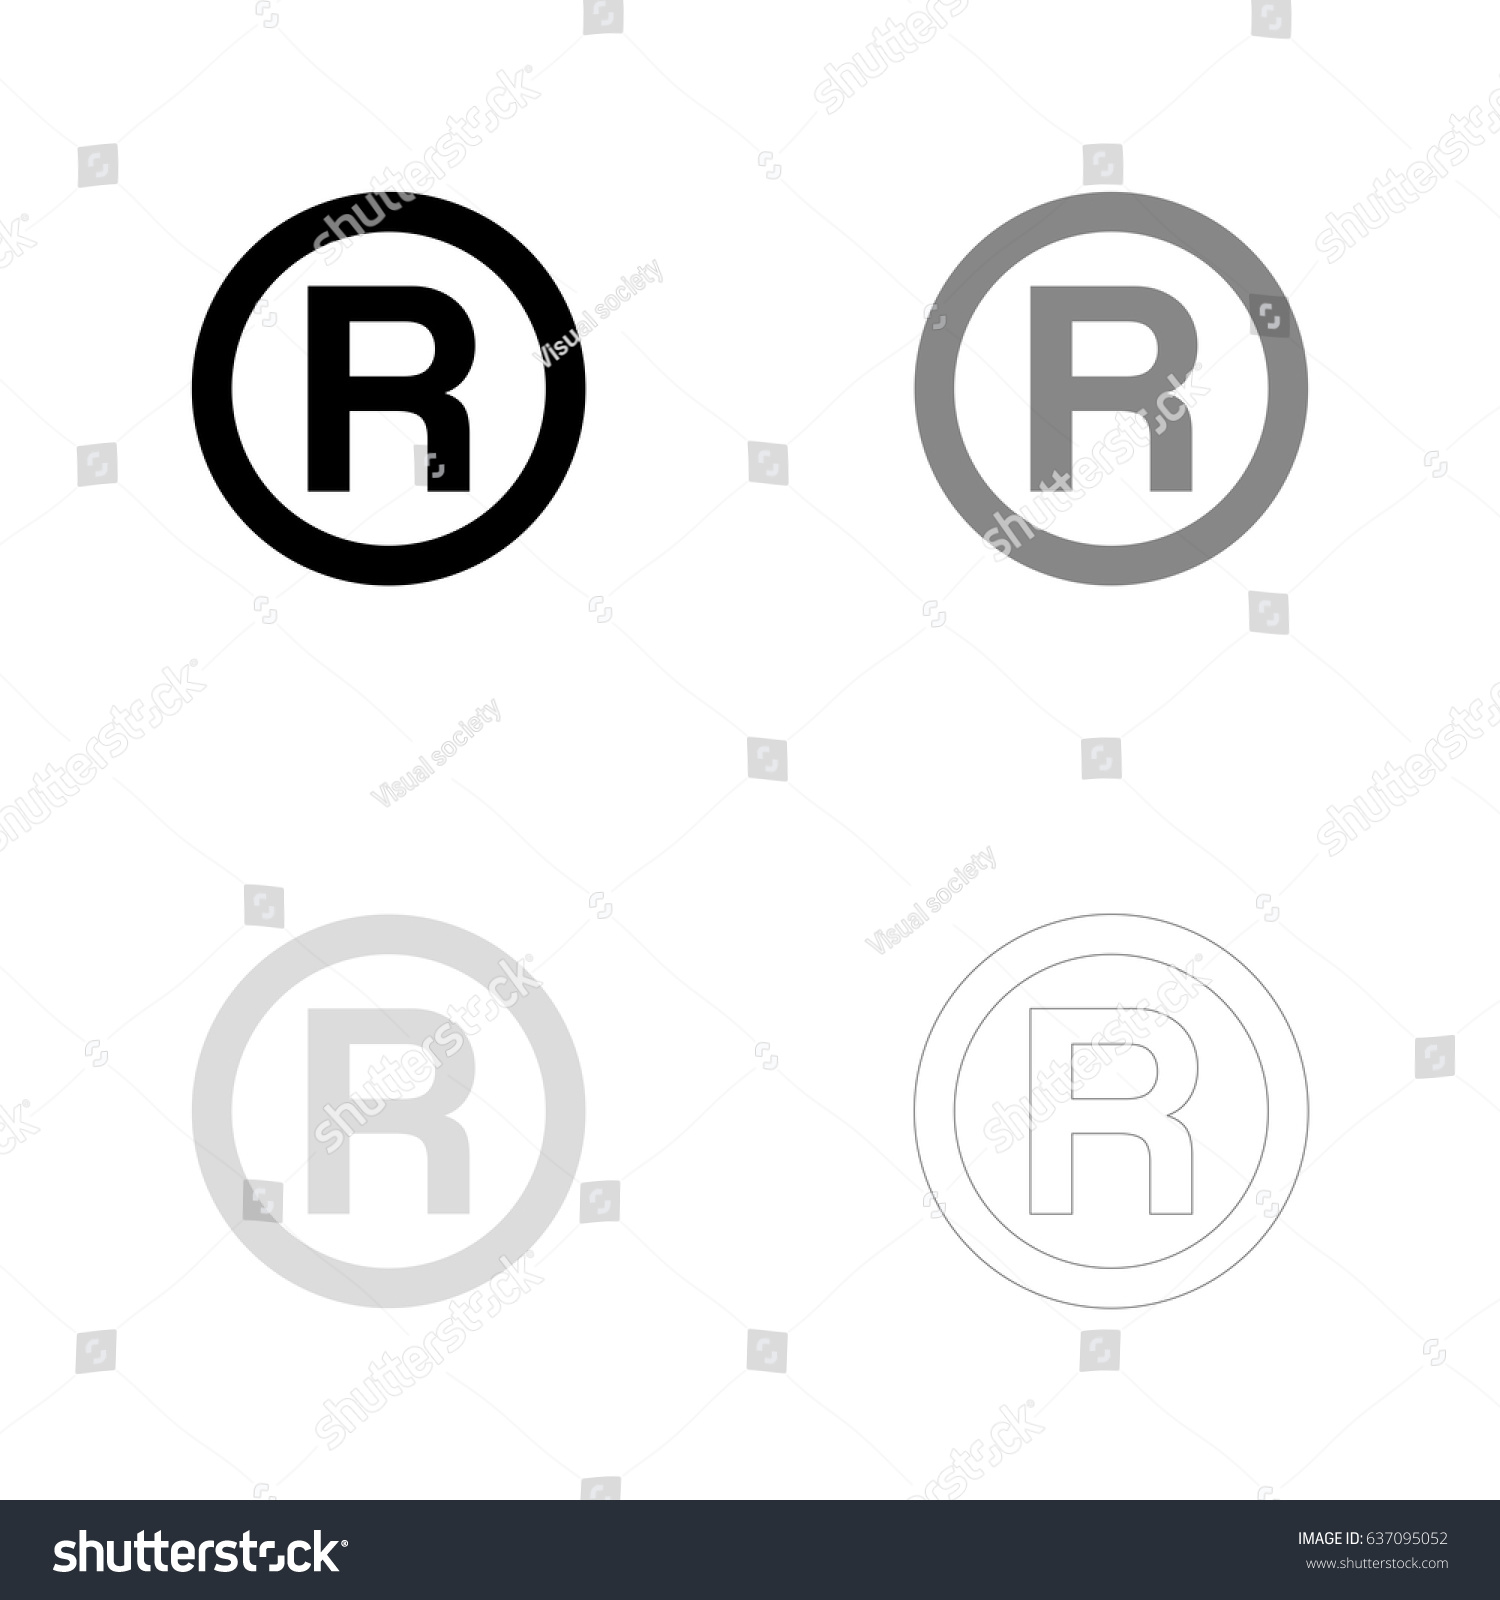 R registered trademark symbol black gray stock vector 637095052 r registered trademark symbol in black gray and line art vector illustration biocorpaavc Gallery